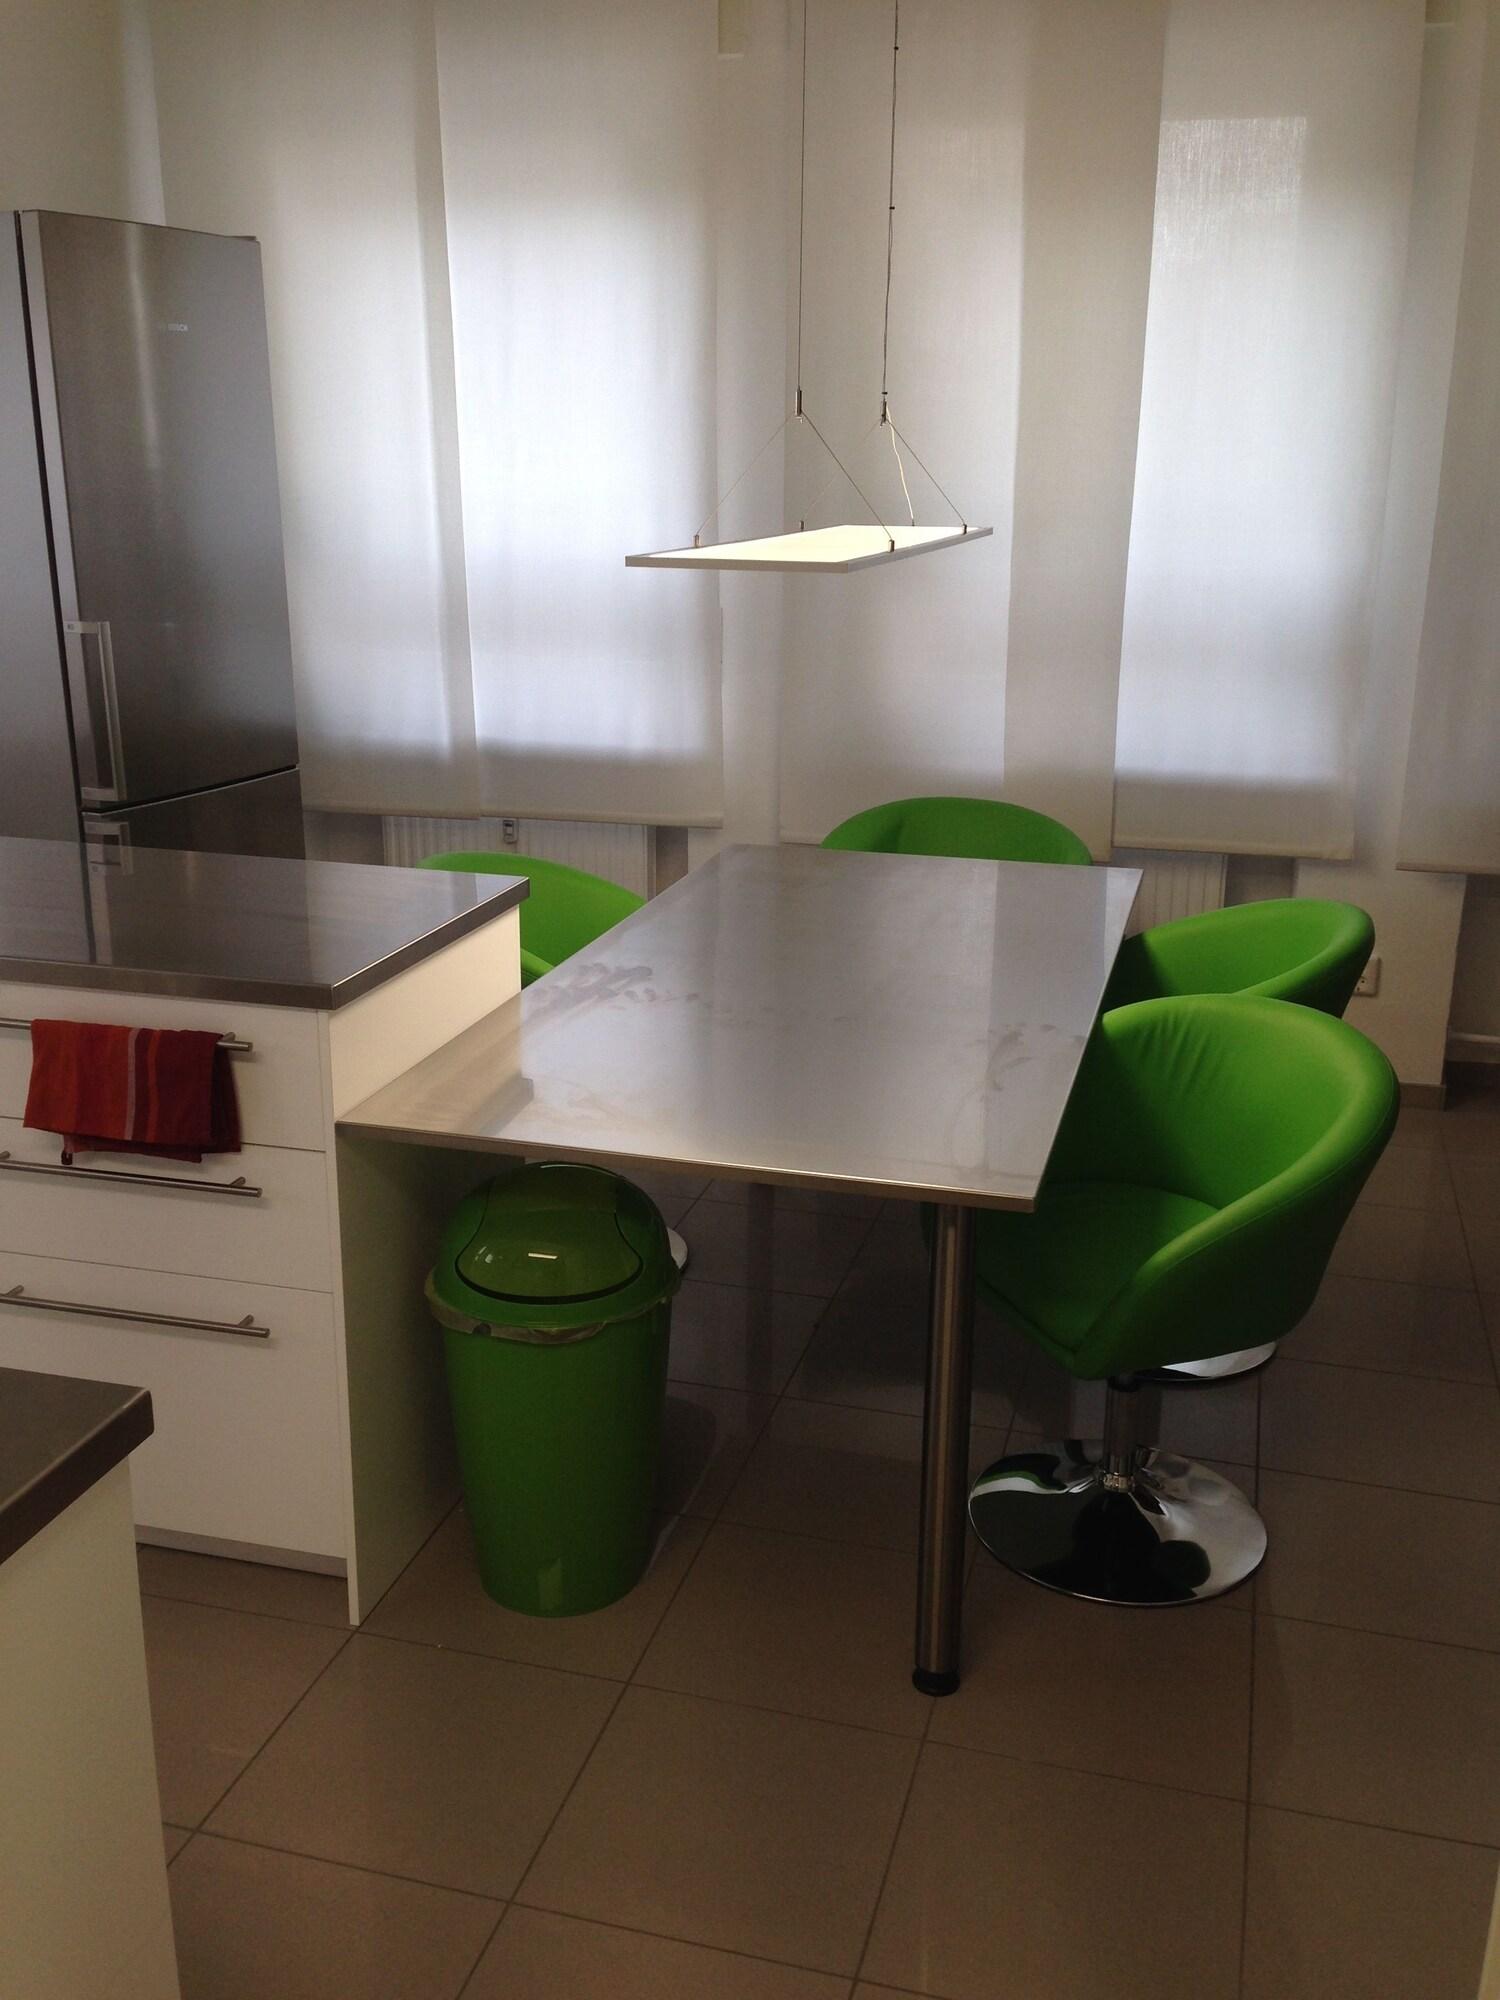 Apartment11, Ulm